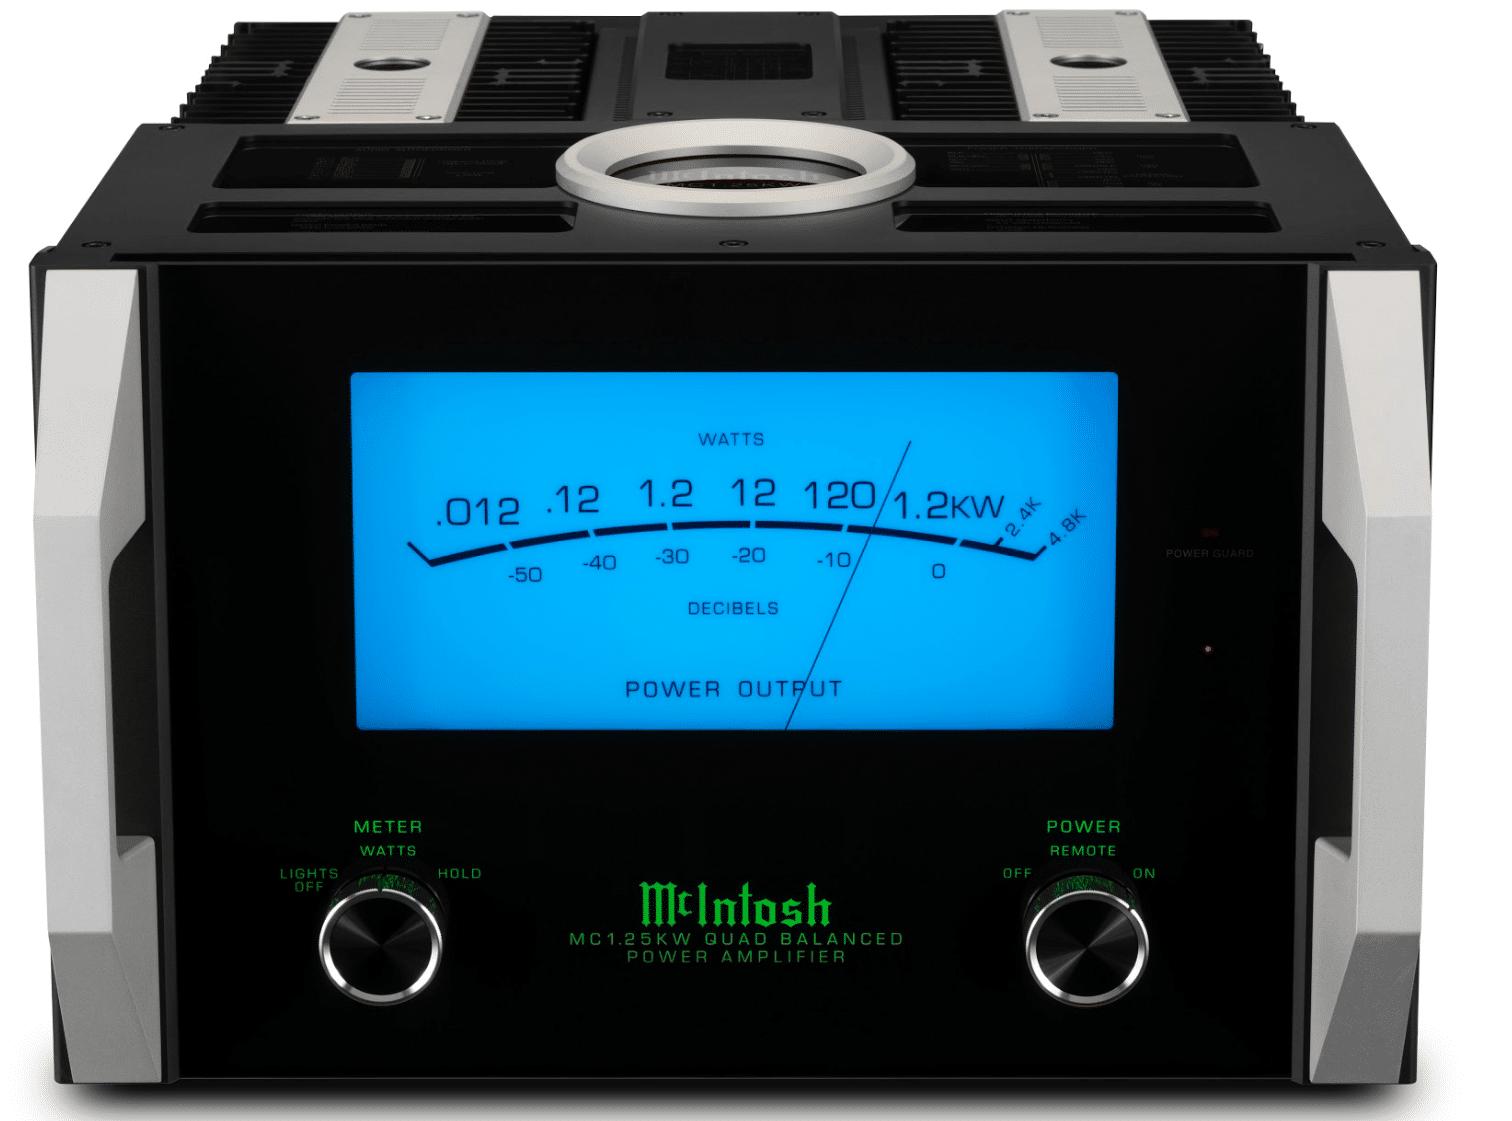 mcintosh mc1 25kw quad balanced power amplifier  single-chassis monoblock amp